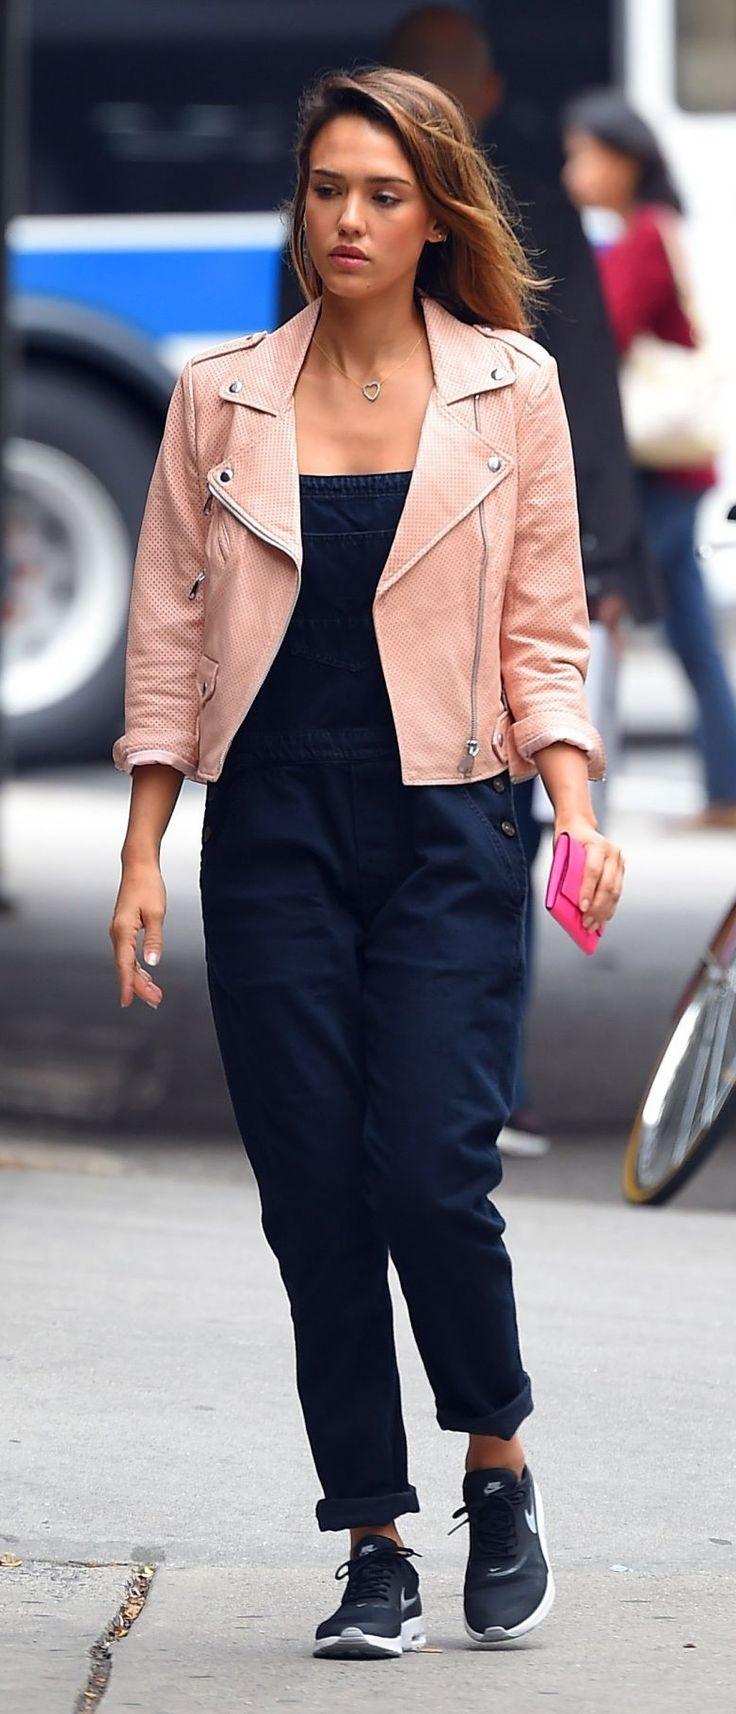 17 Best Ideas About Jessica Alba Fashion On Pinterest Jessica Alba Style Celebrity Style 2014